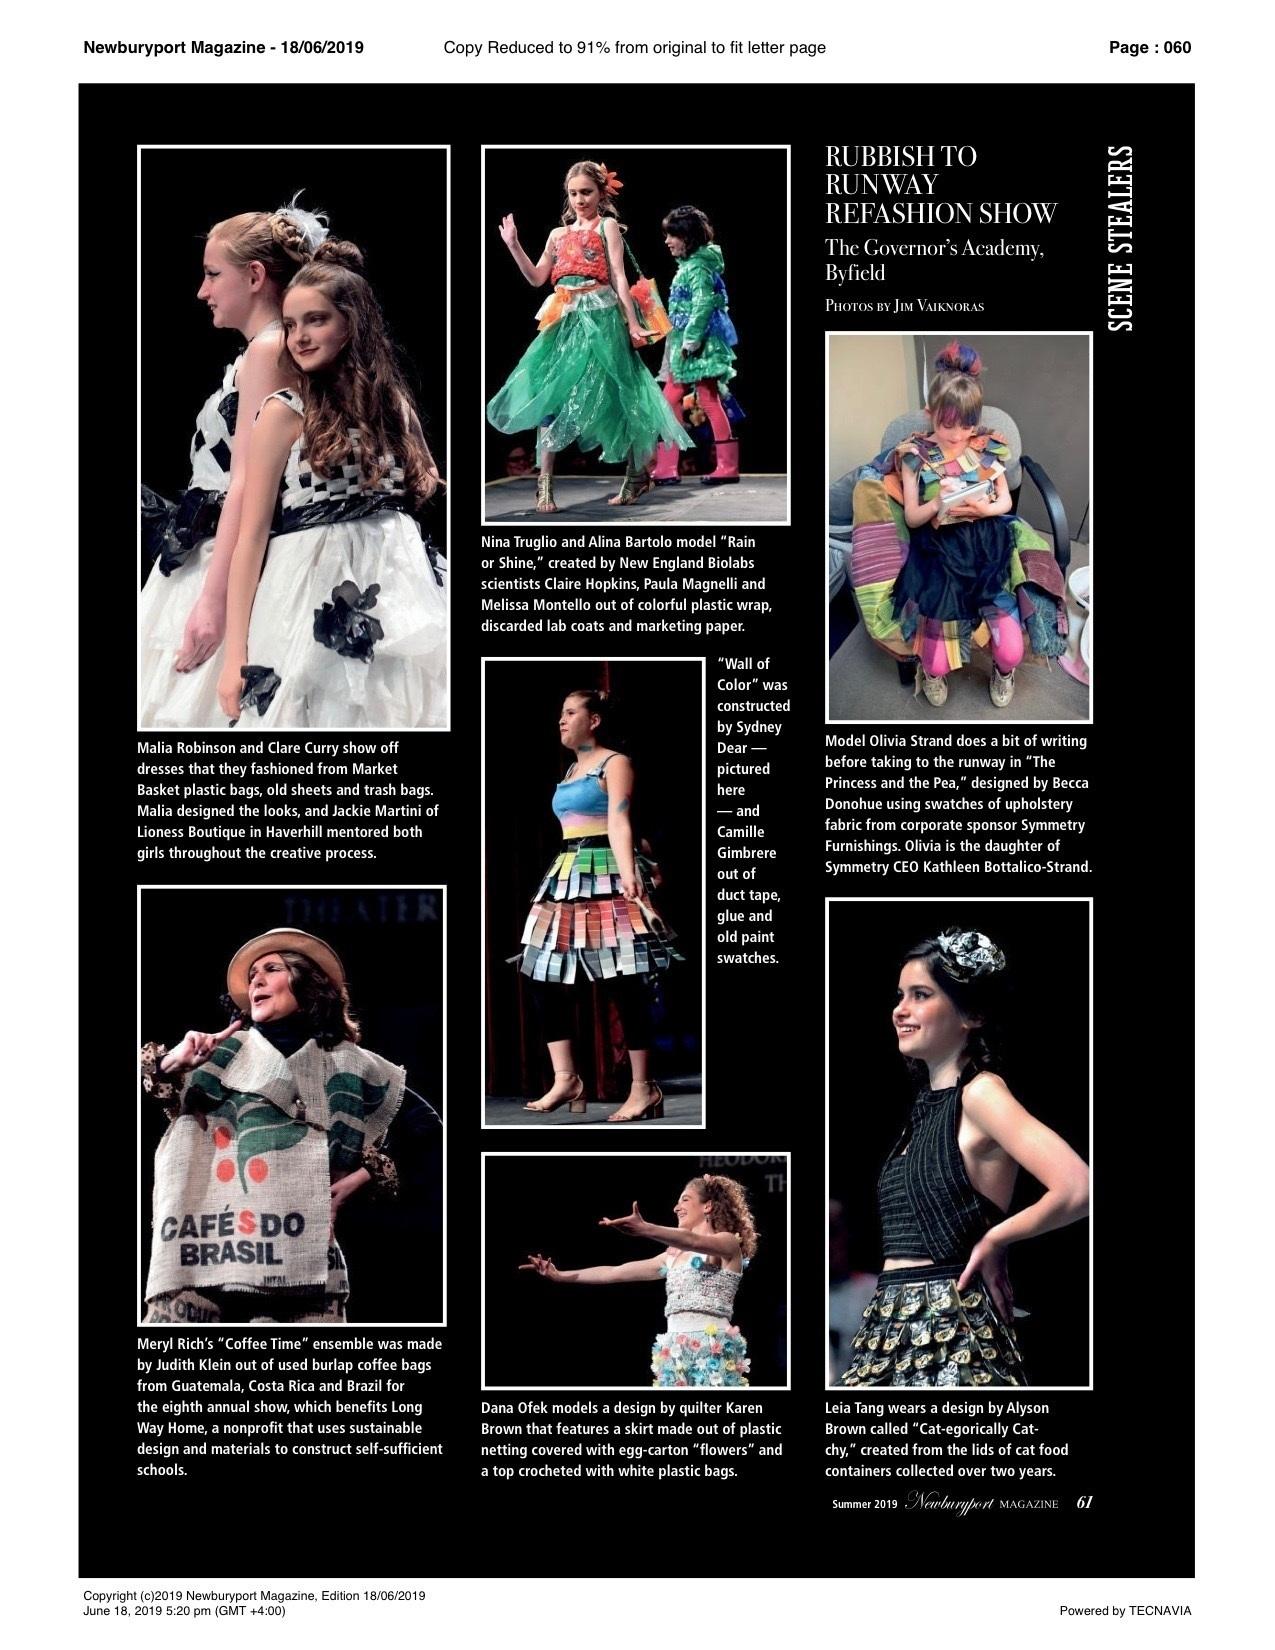 Newburyport_Magazine%252Bpdf.jpg